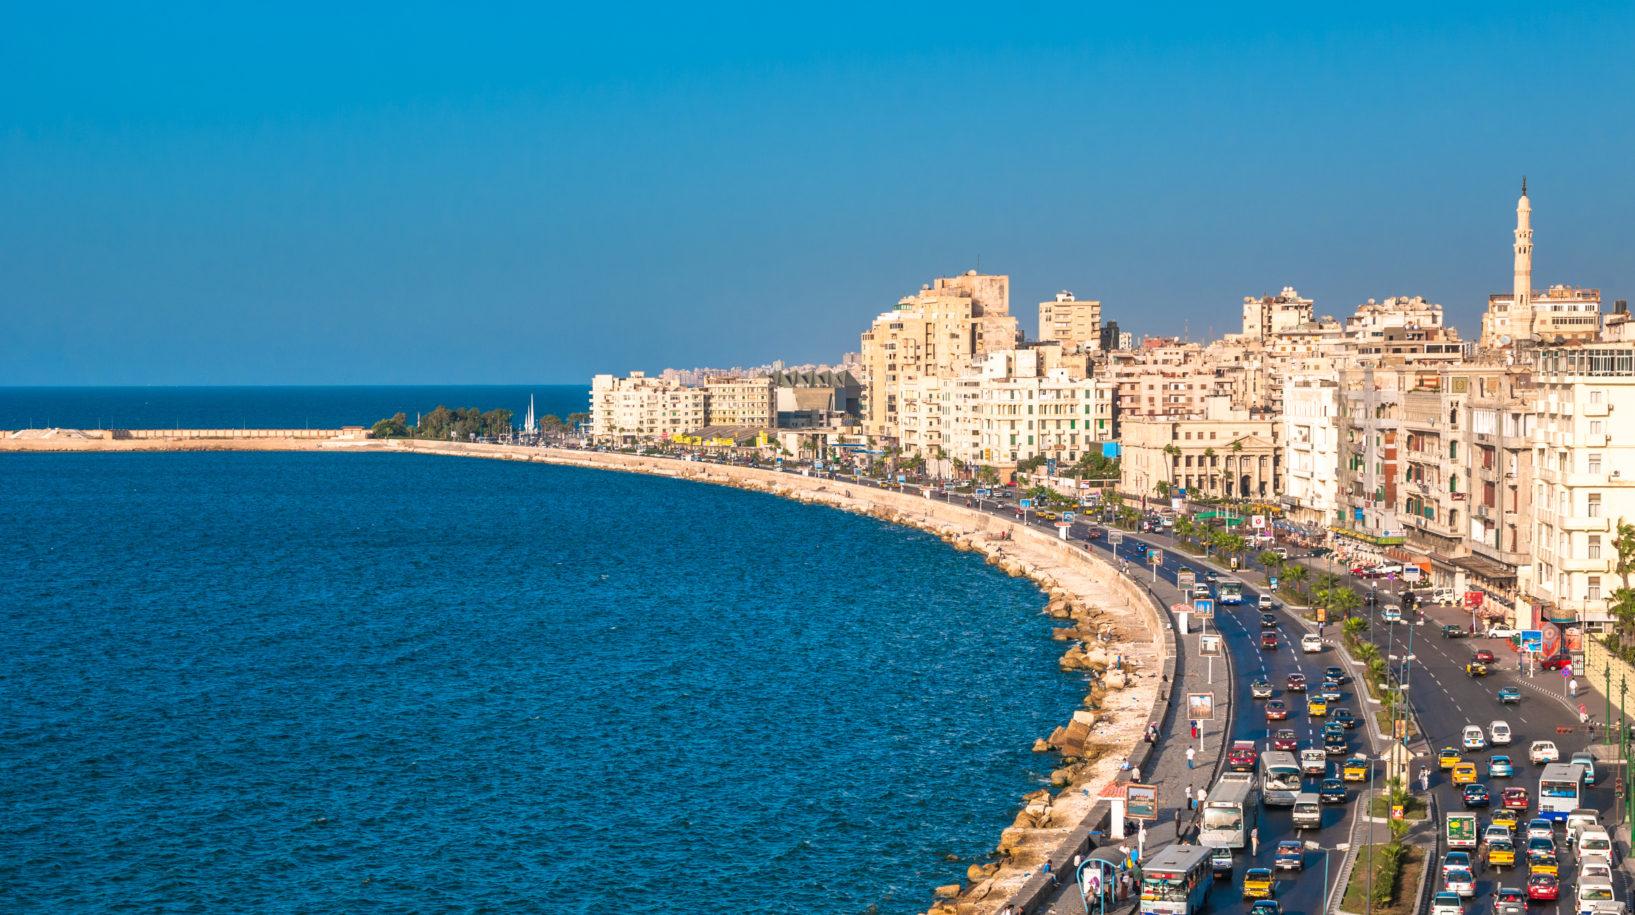 Caire / Alexandrie / Port Said